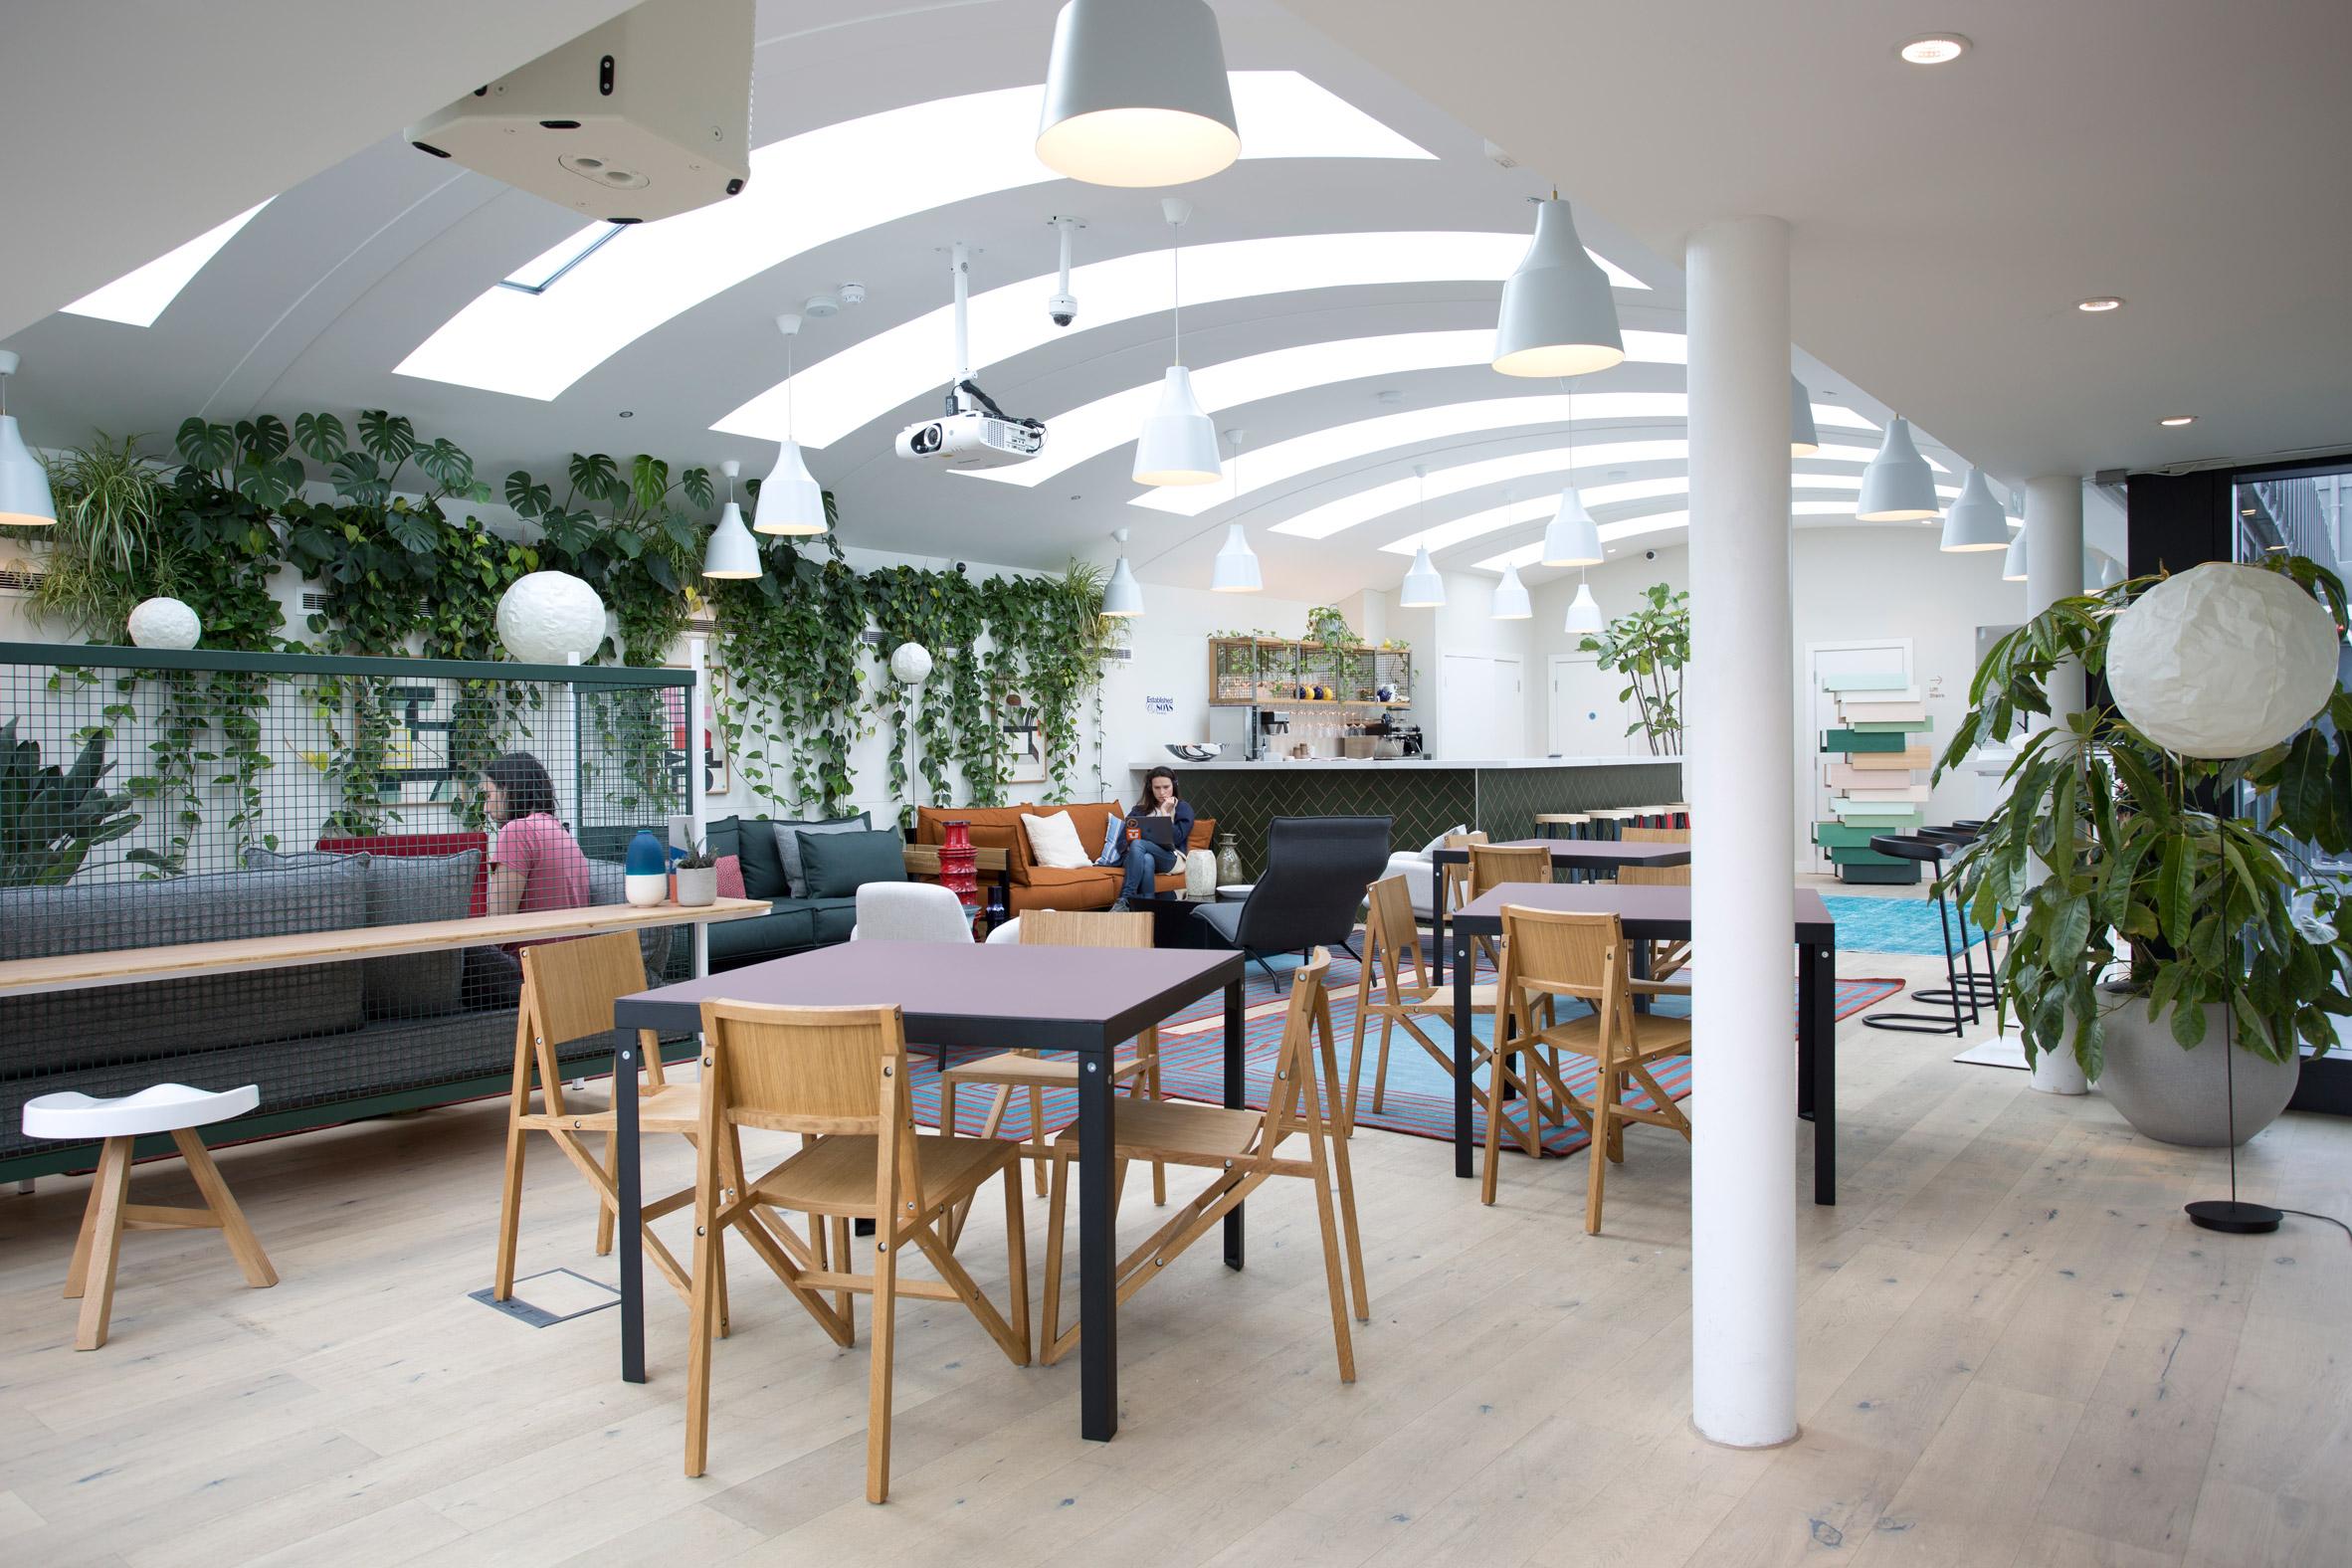 established-sons-at-work-office-furniture-fora_dezeen_2364_col_3.jpg